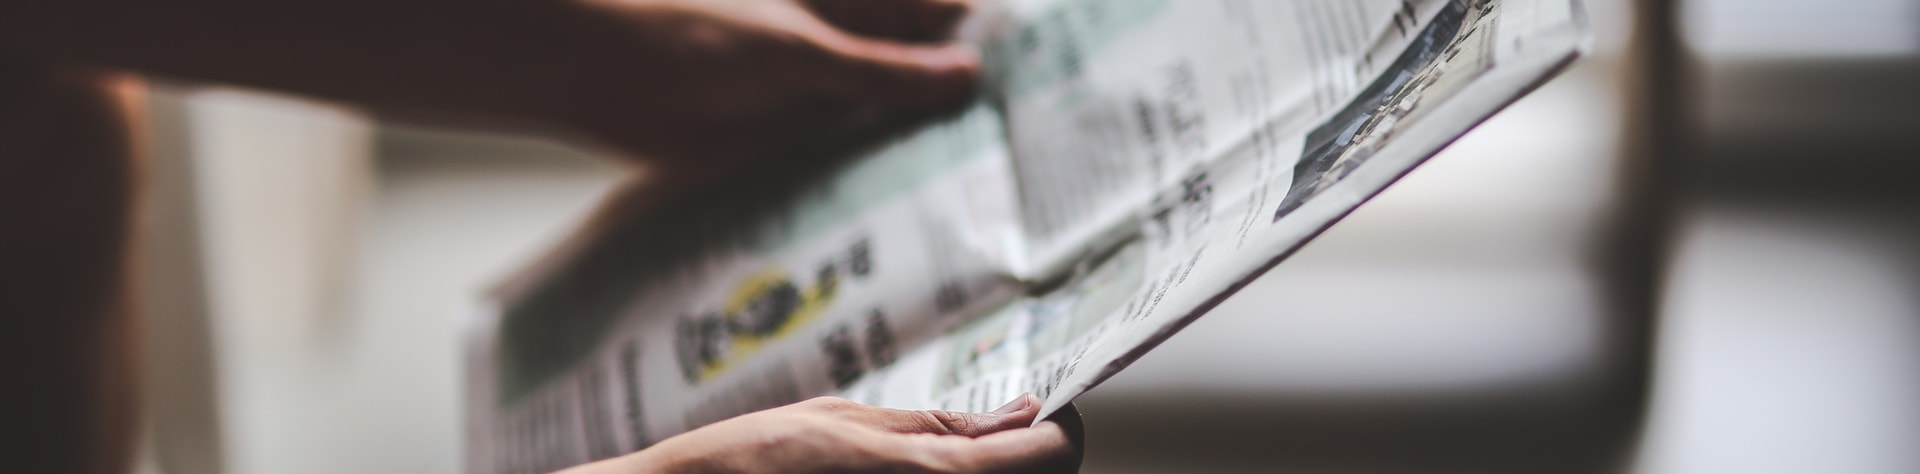 Rassegna Stampa Breda